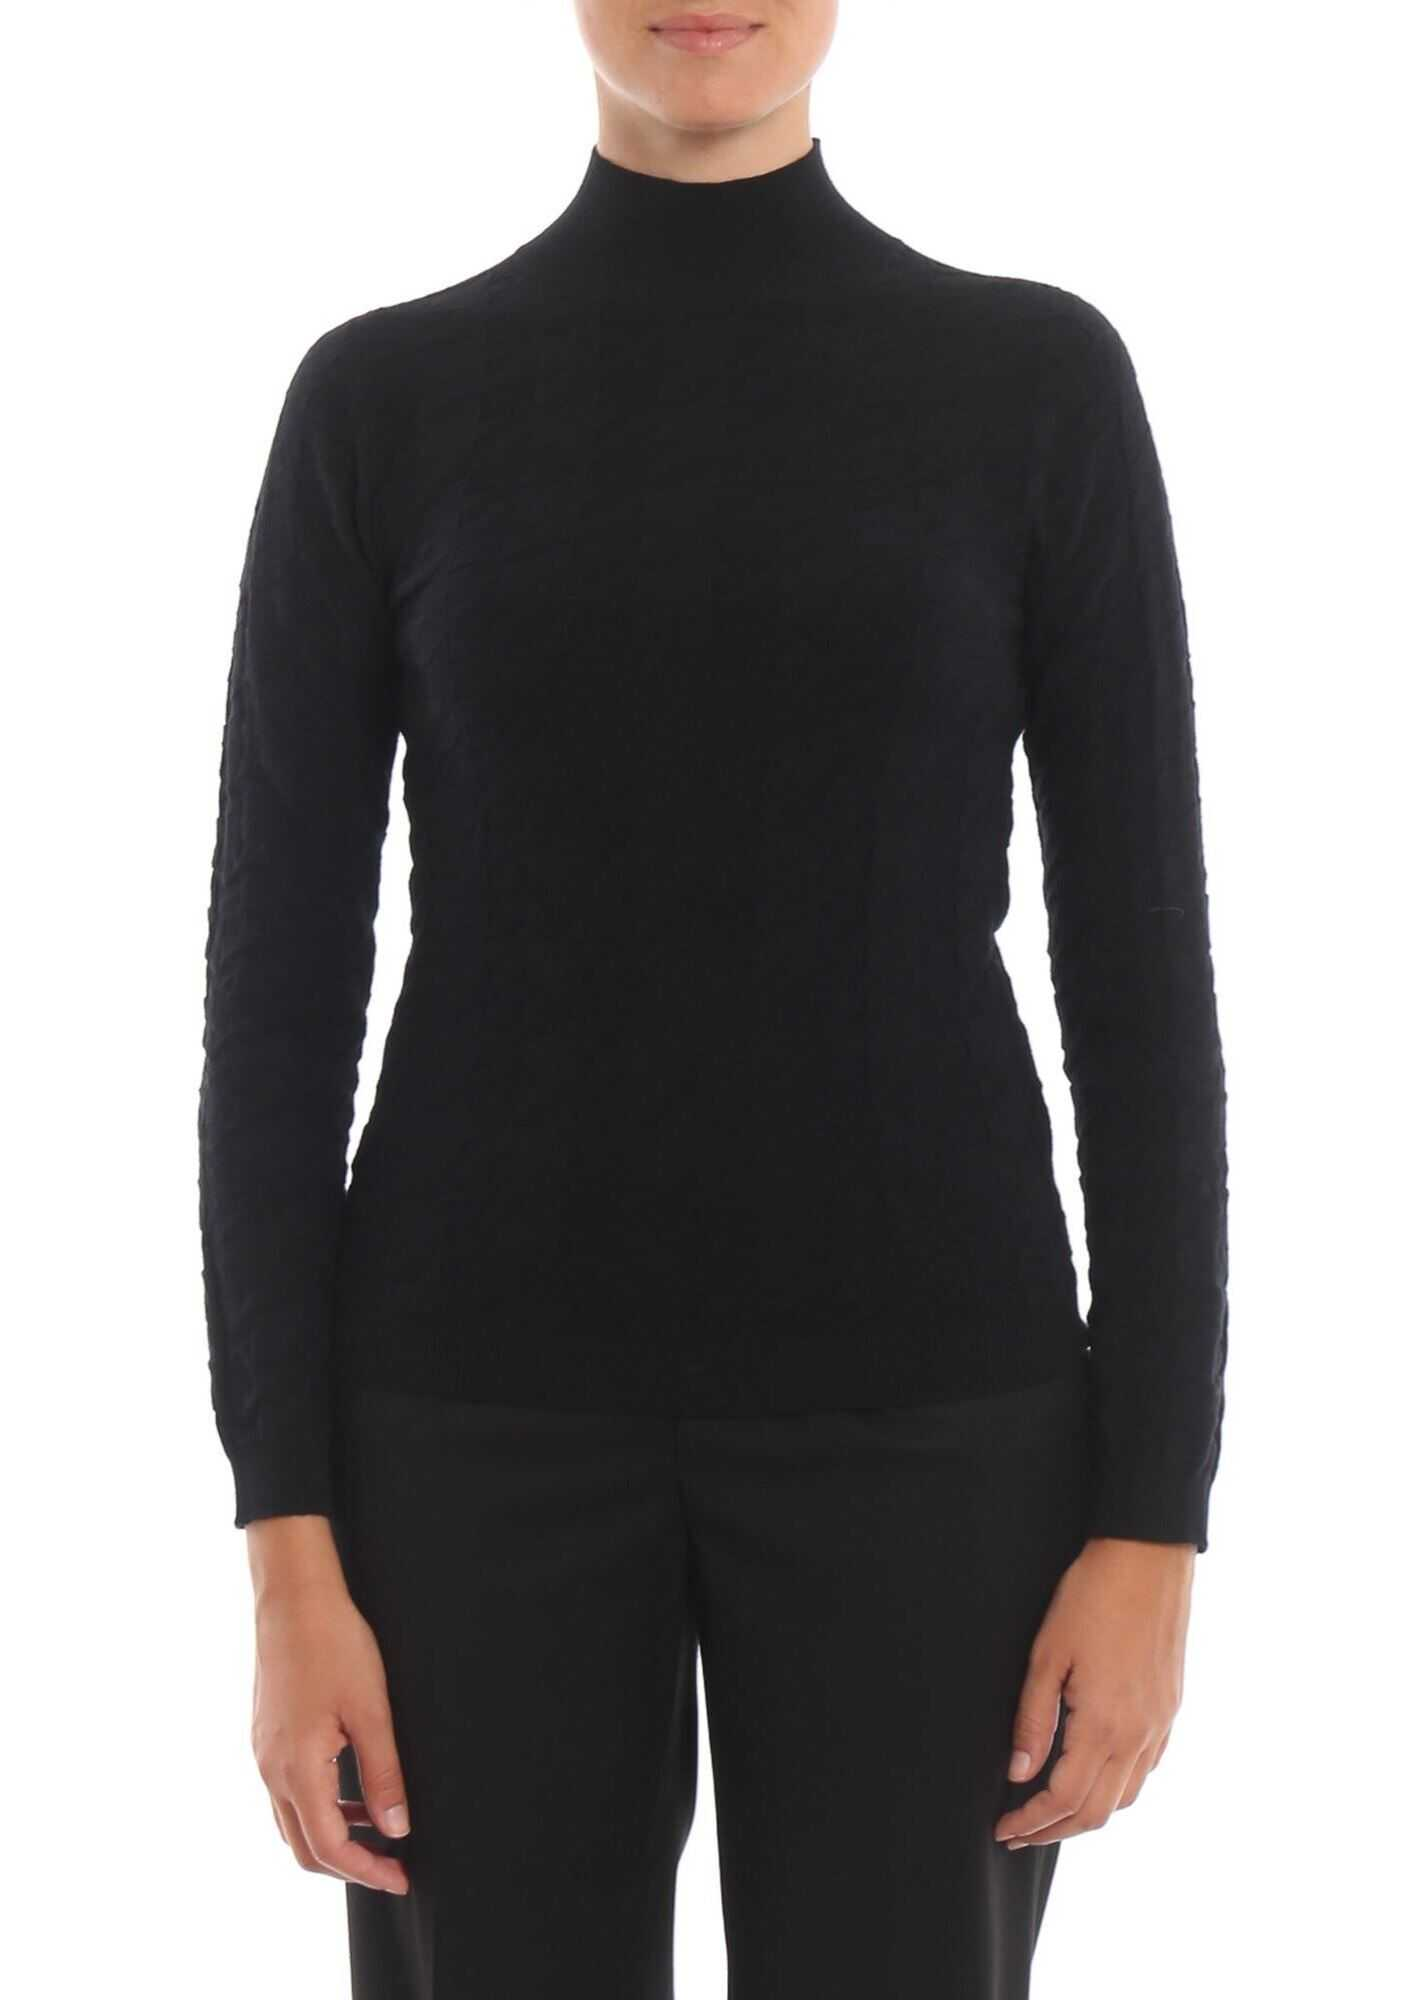 Blumarine Black Wool Turtleneck Sweater Black